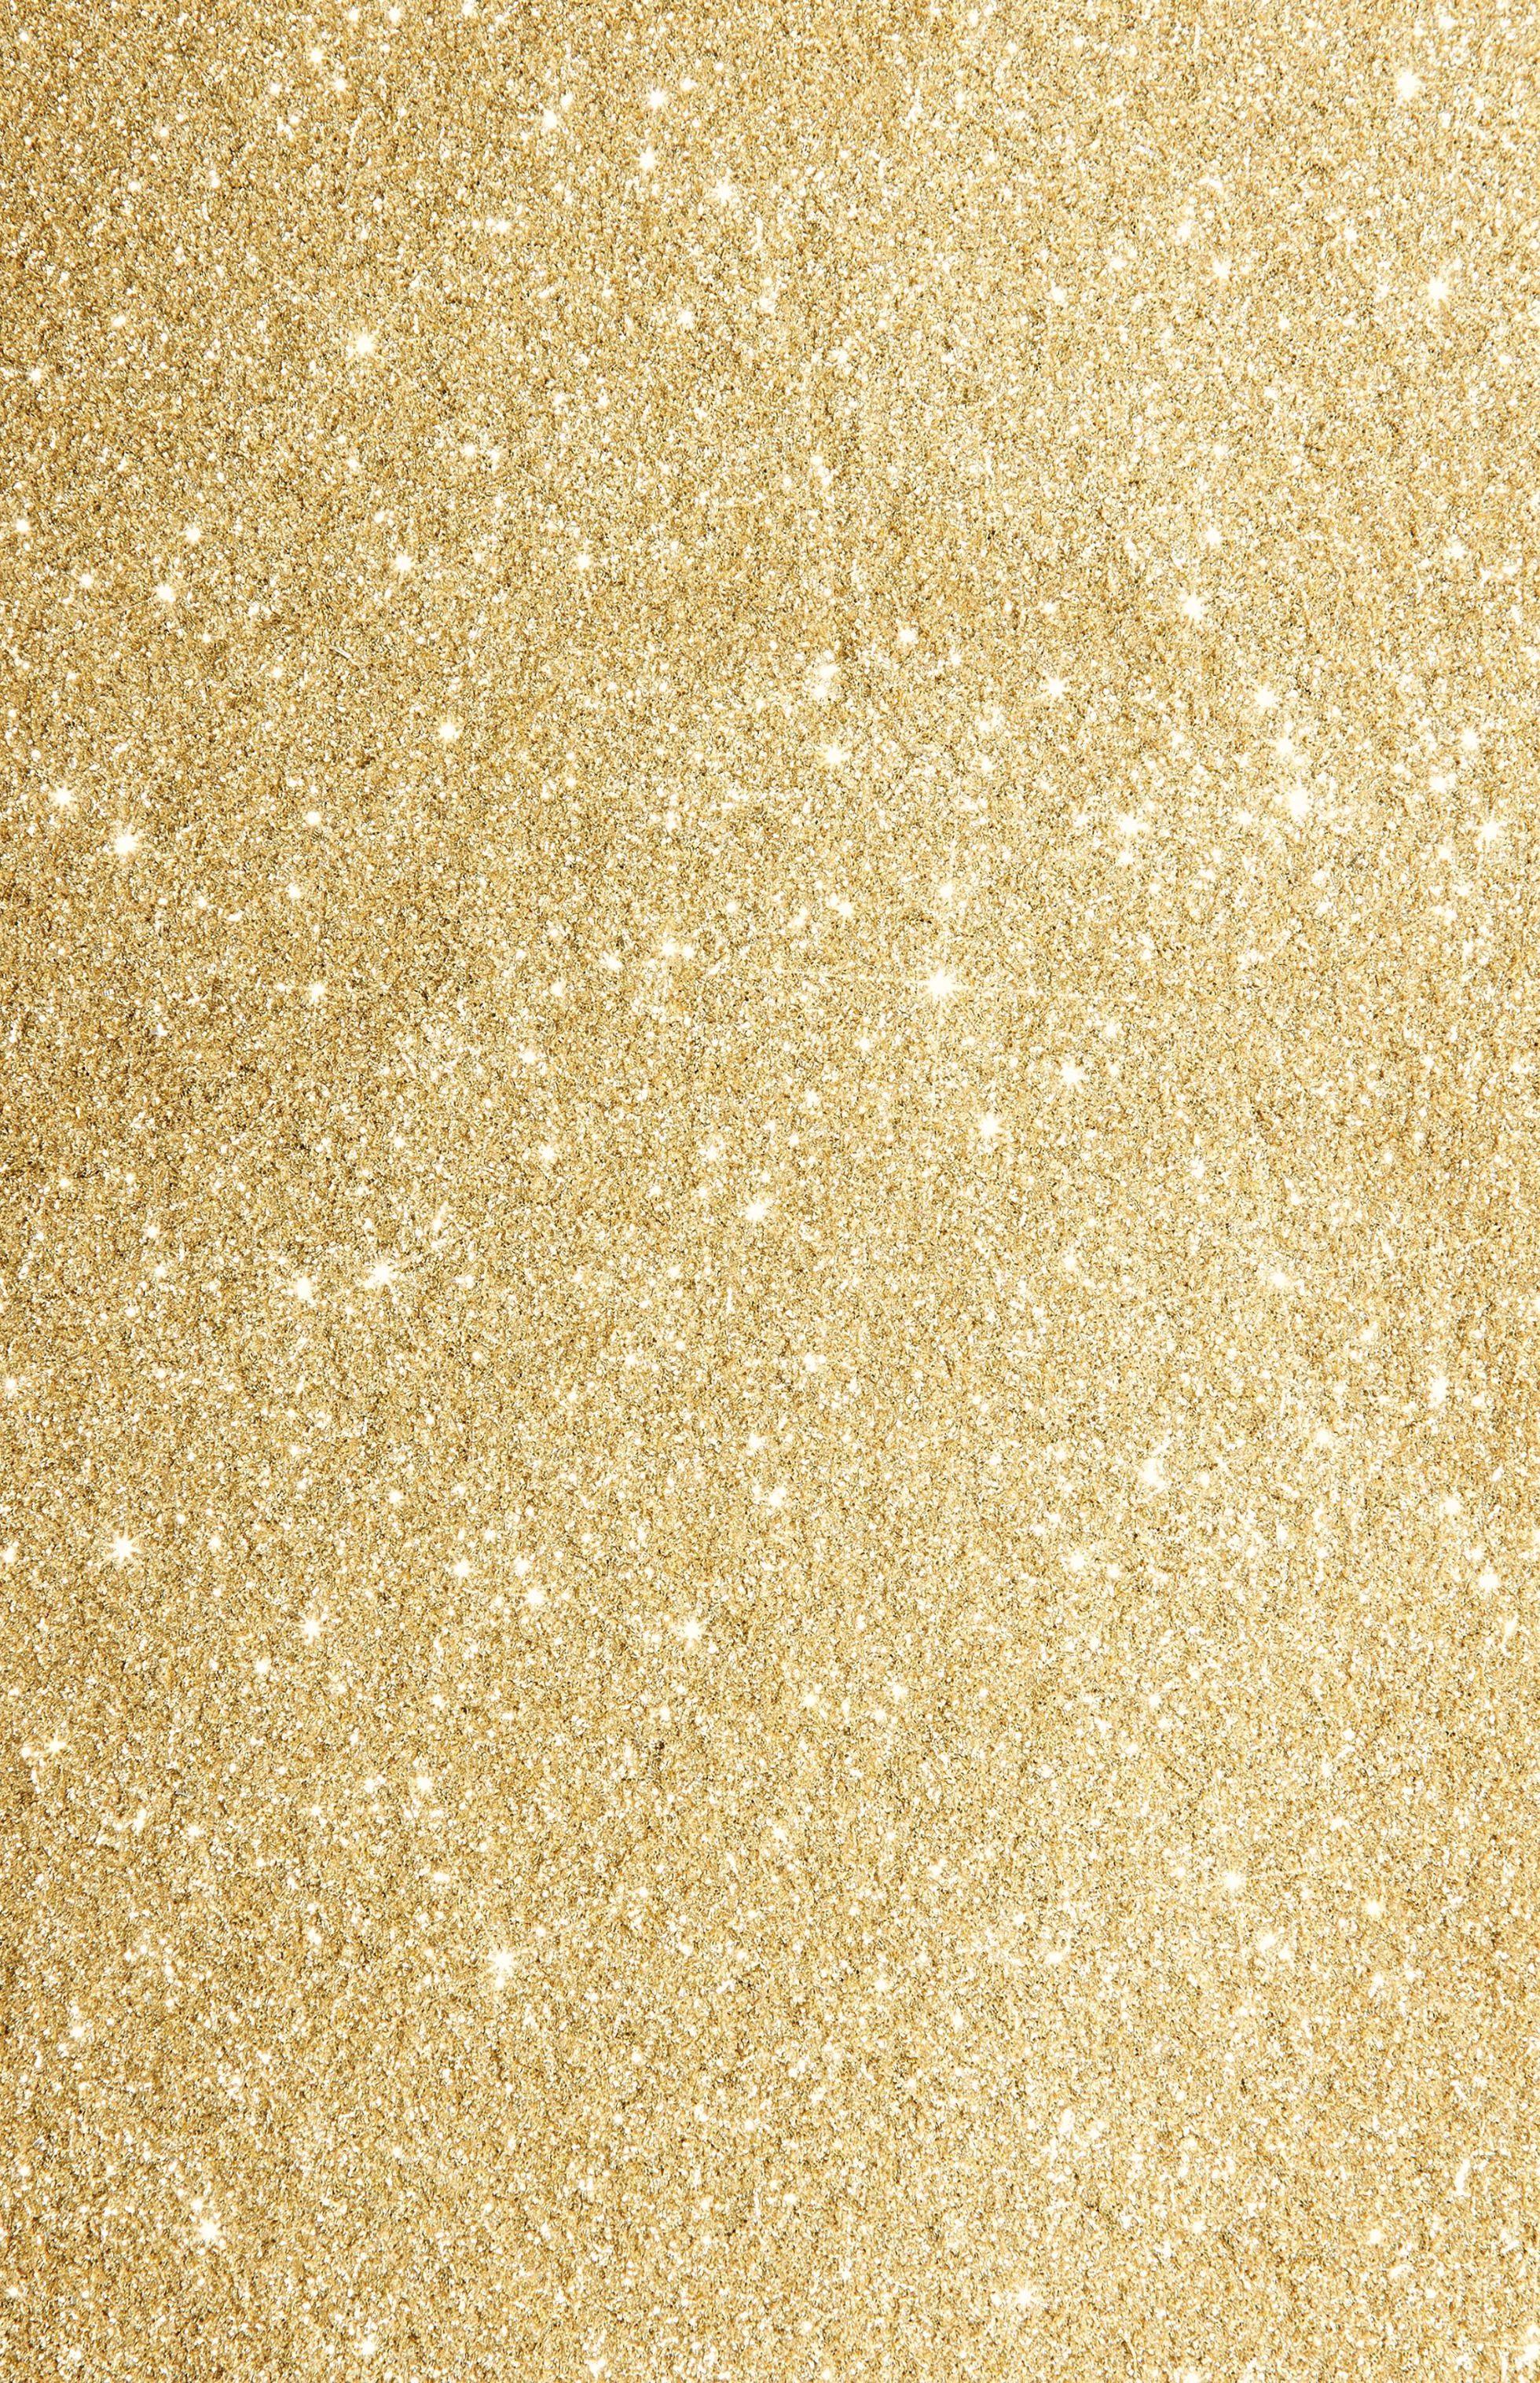 New Years Eve Gold Wallpaper NY Or Xmas Pinterest